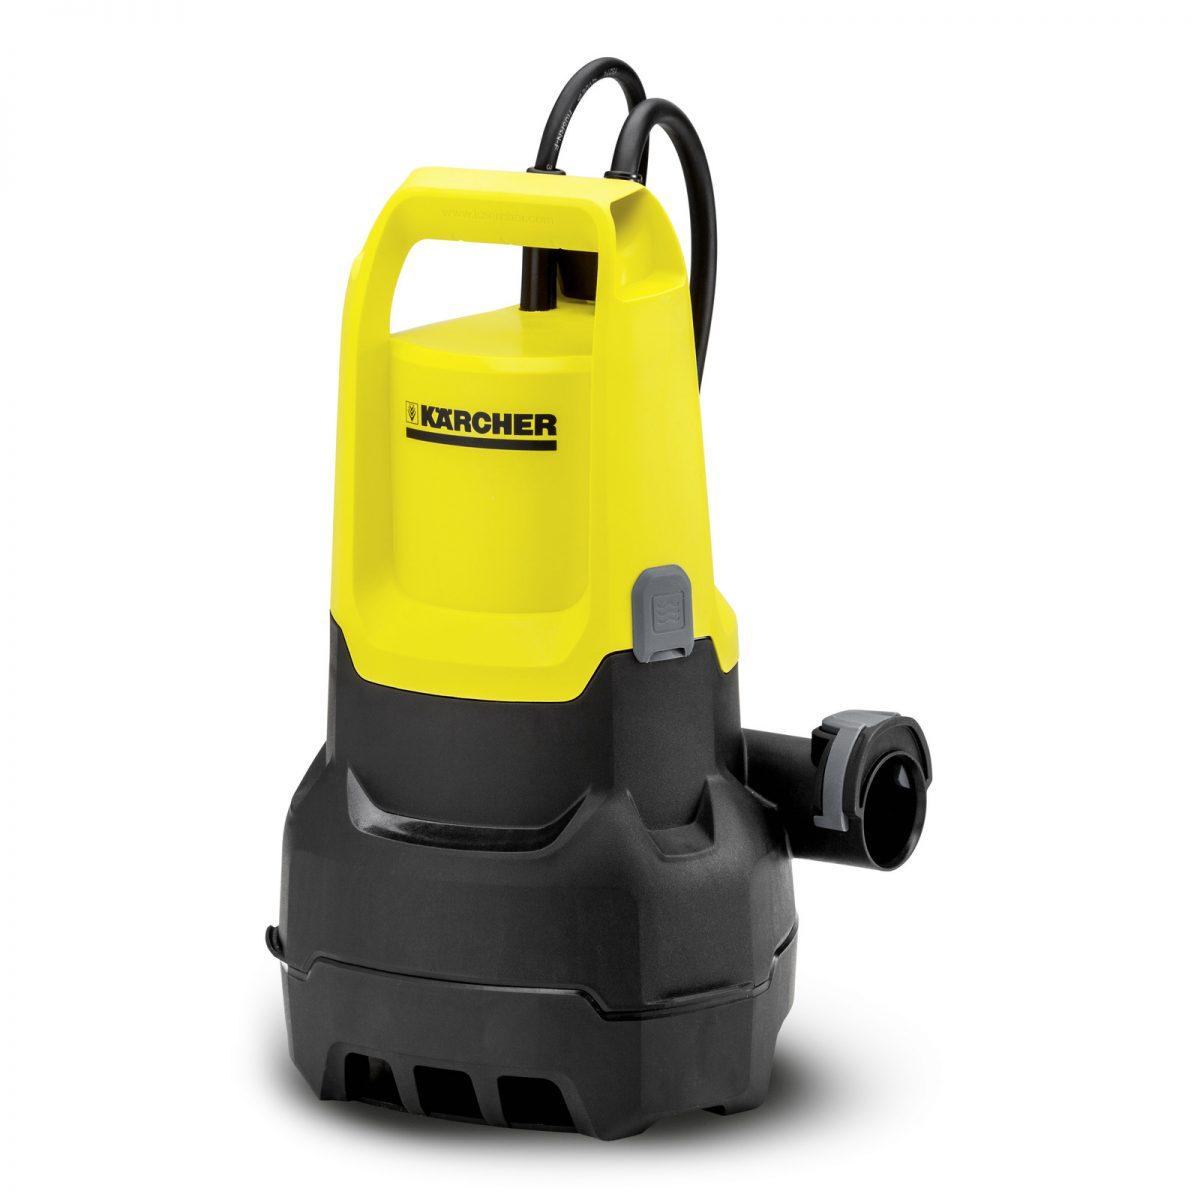 KARCHER 1.645-513.0 - SP5 Submersible Dirty Pump